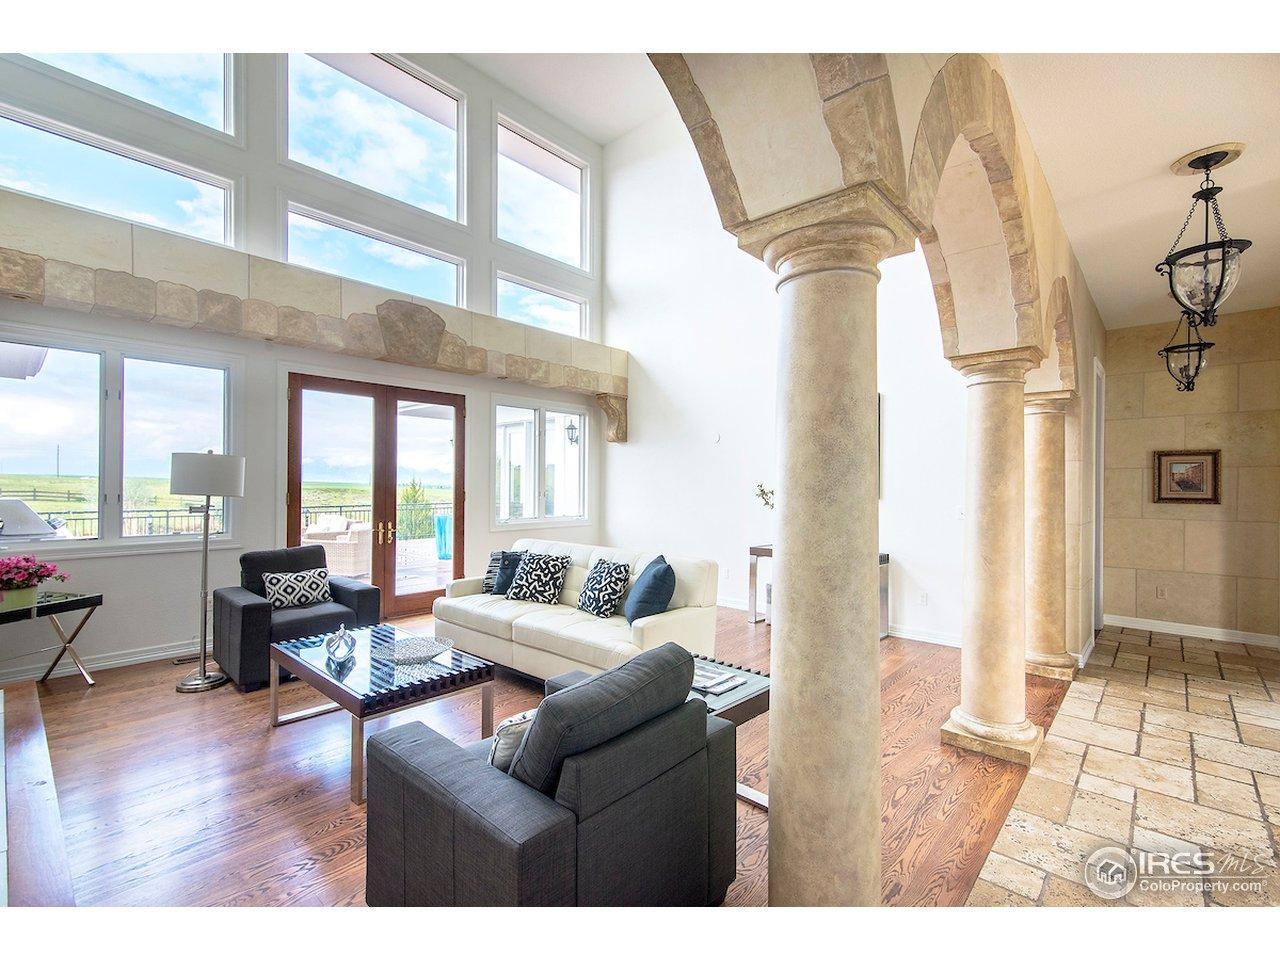 Floor to ceiling windows and doors to deck.